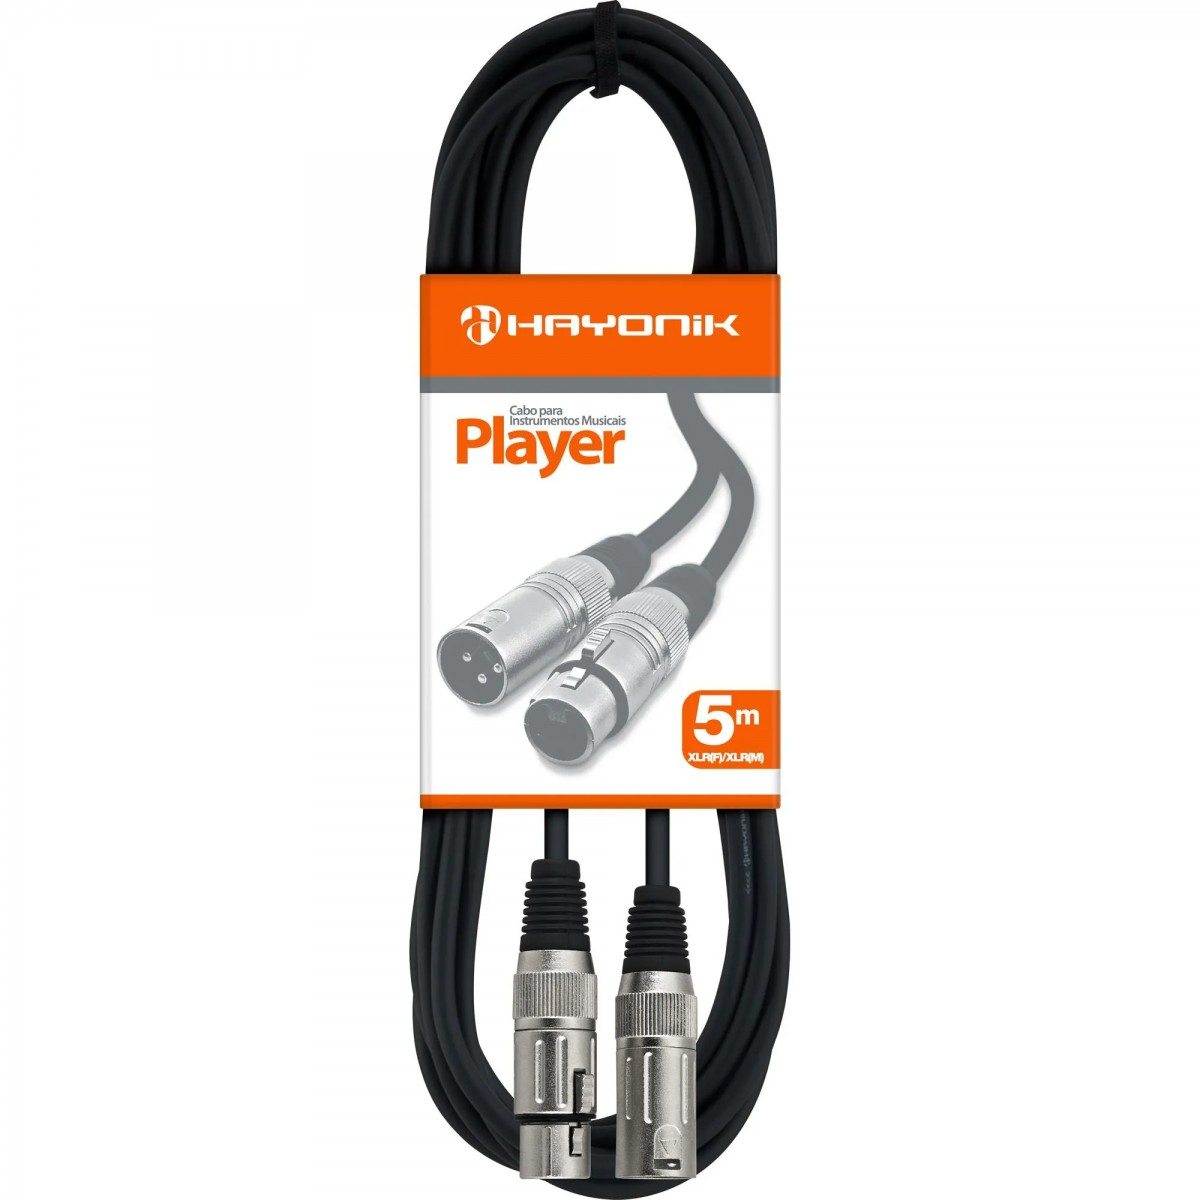 Imagem do produto Cabo para Microfone XLR(F) X XLR(M) 5m HAYONIK PLAYER